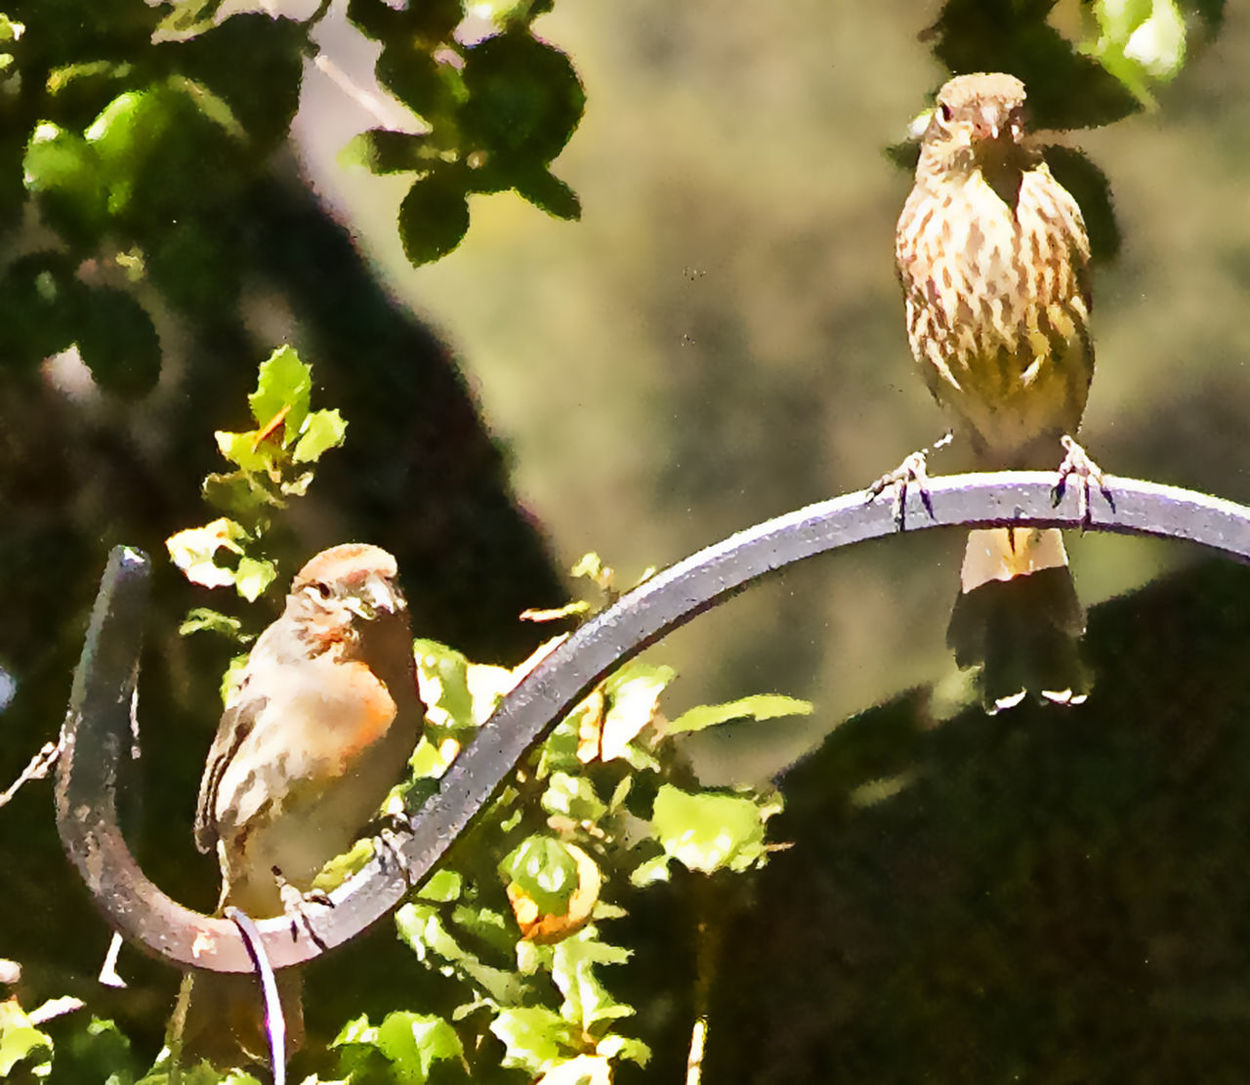 Bird Bird Series Finches No People Outdoors Perching Resting Birds Sunlight